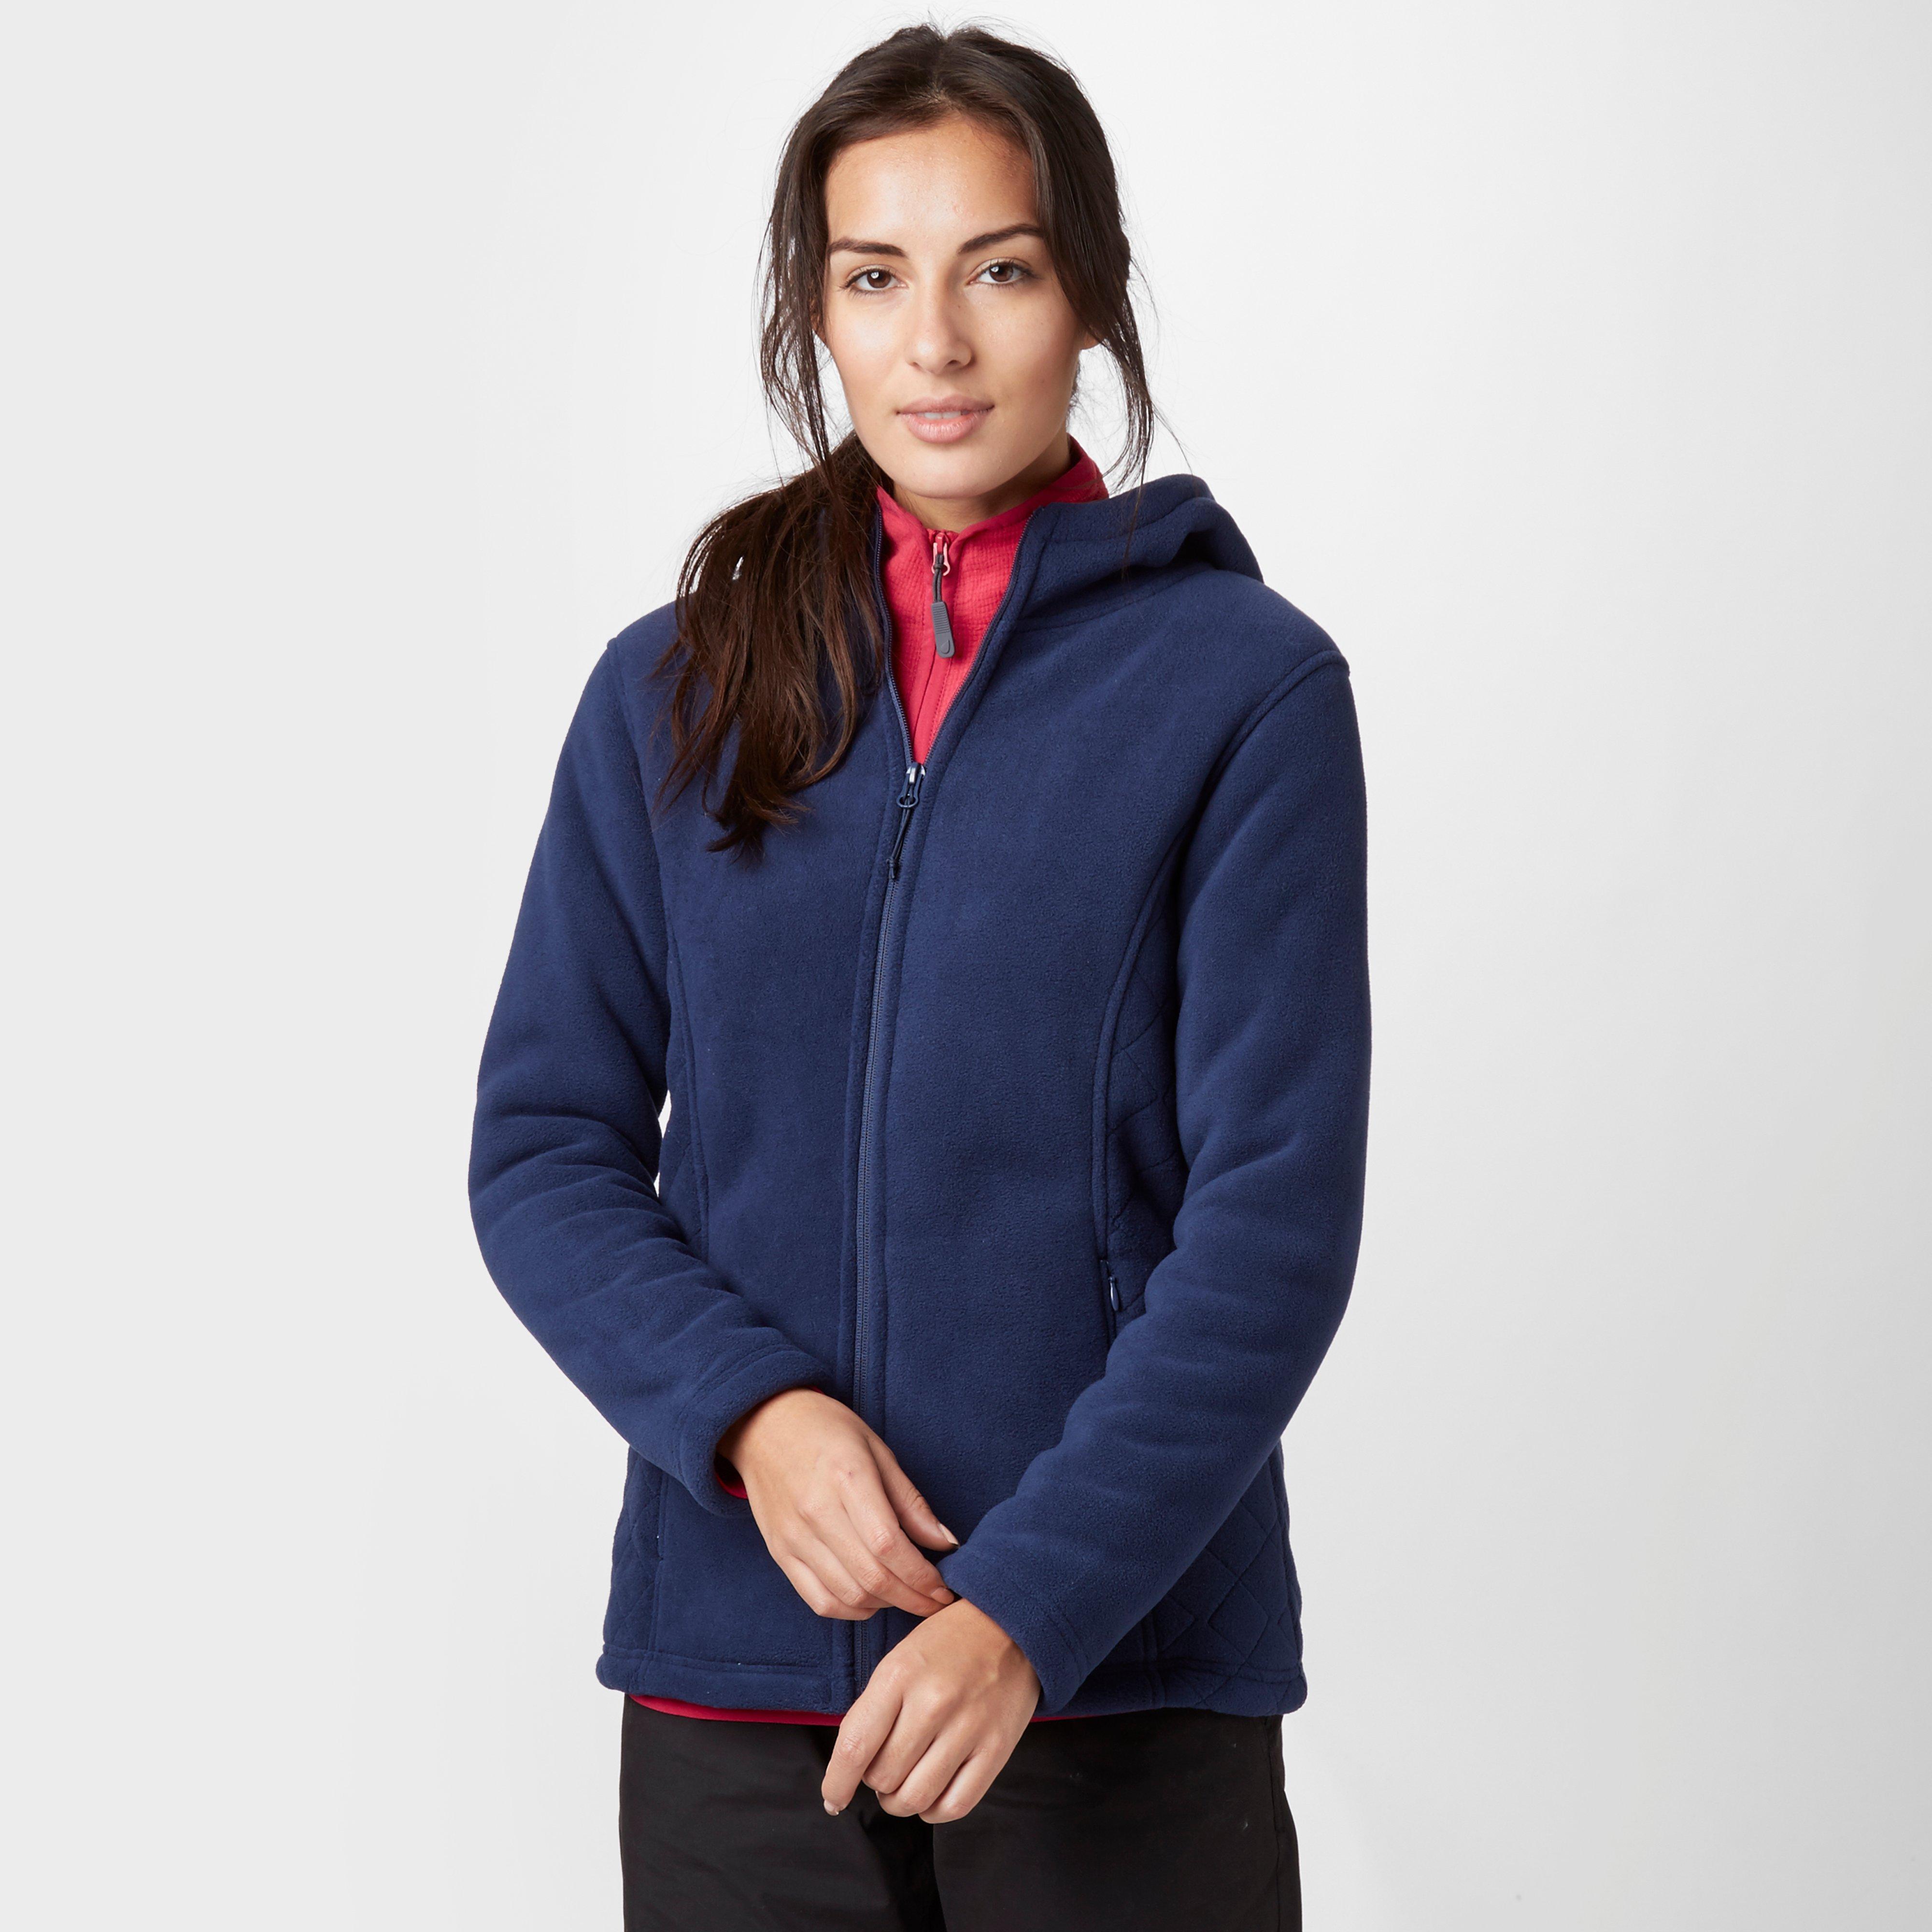 Peter Storm Women's Celia Hooded Fleece Jacket | Bear Grylls UK ...